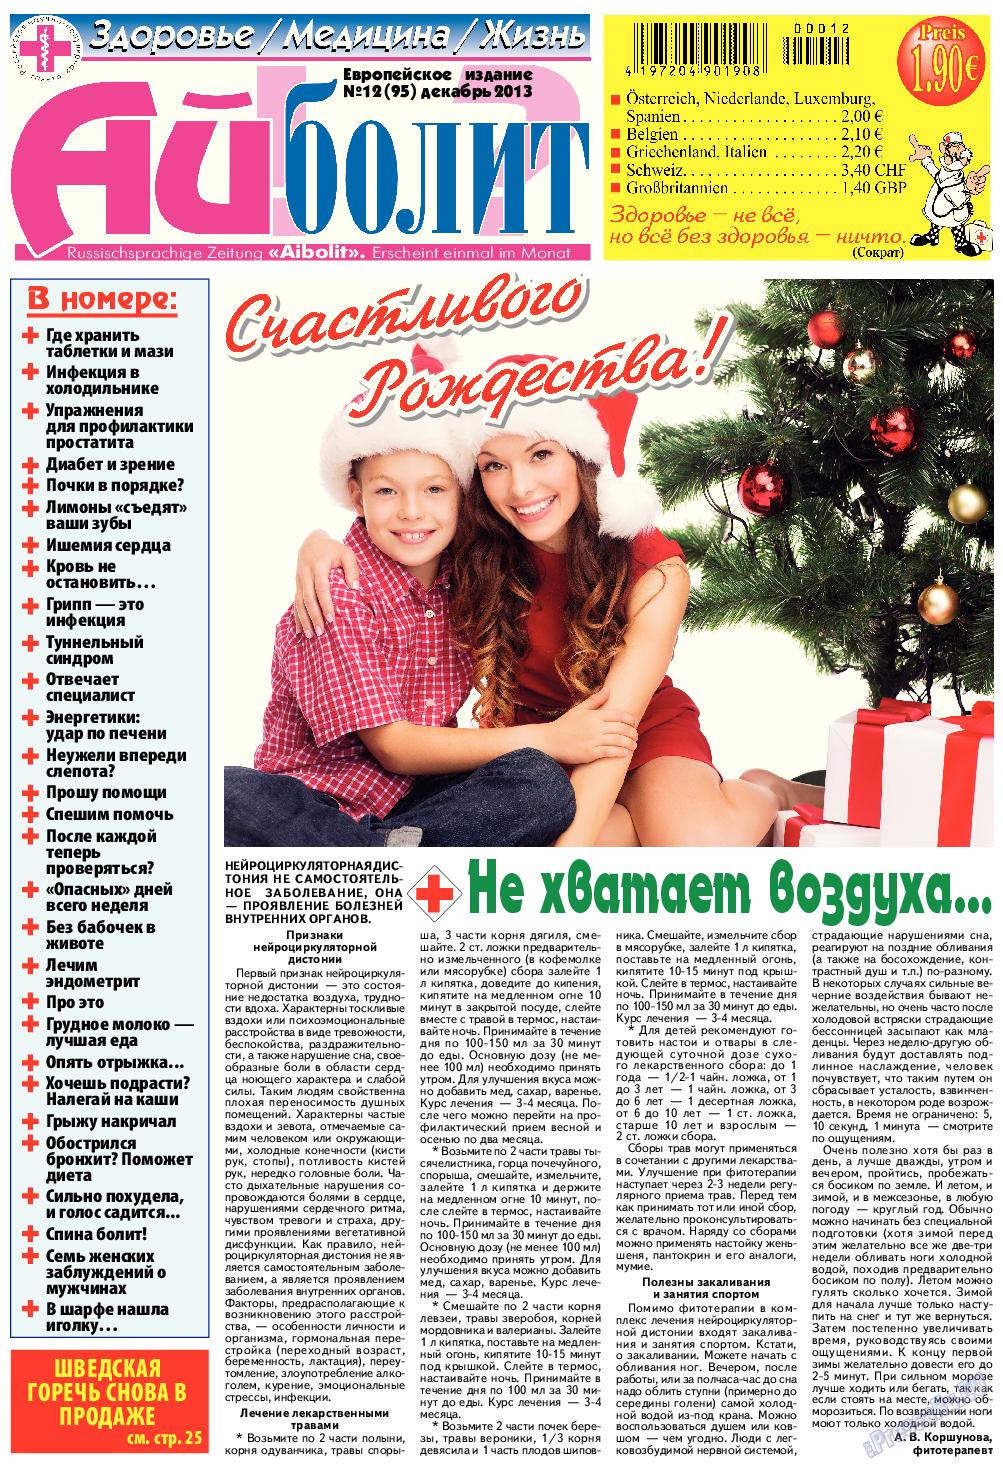 АйБолит (газета). 2013 год, номер 12, стр. 1